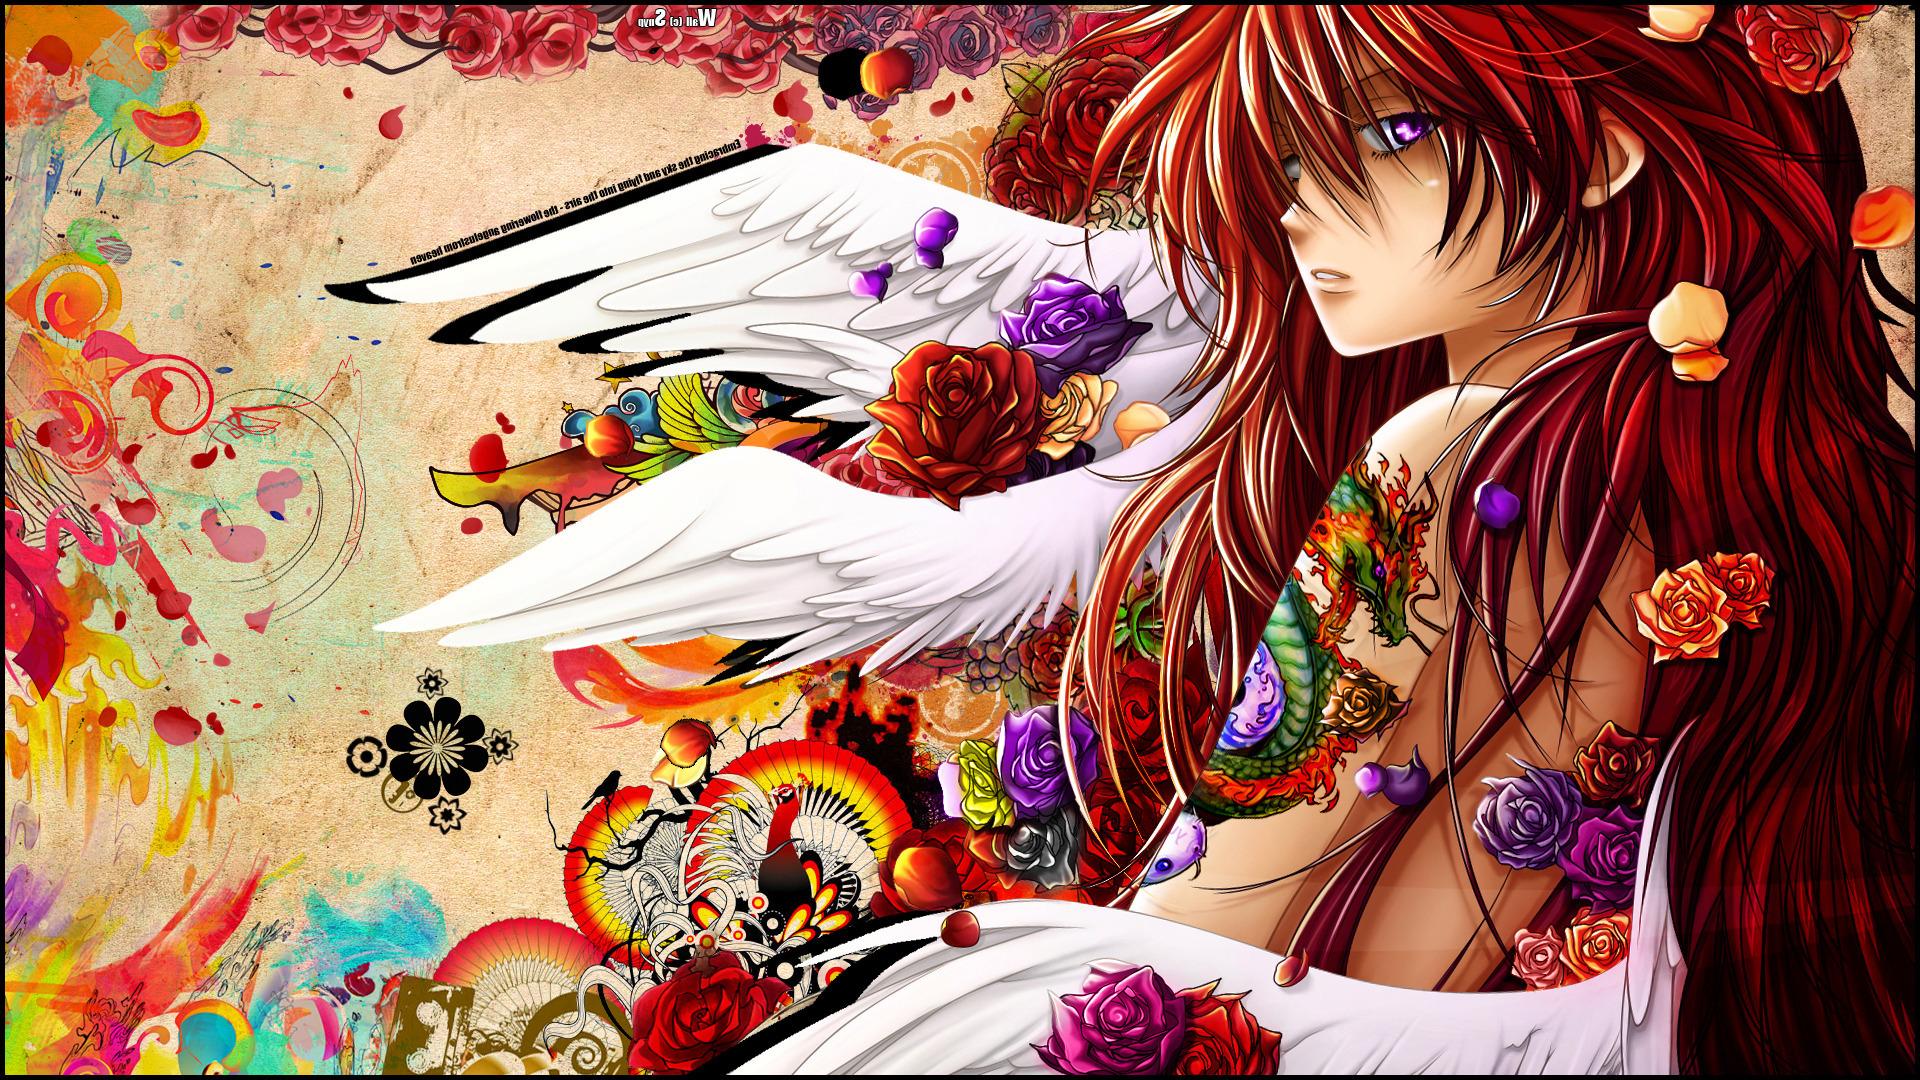 colorful-illustration-digital-art-redhead-flowers-anime-anime-girls-wings-angel-artwork-tattoo-original-characters-rose-purple-eyes-Snyp-ART-flower-girl-graphics-1920x1080-px-computer-wallpaper-fictional-character-mangaka-comics-artist-fiction-cg-artwork-798906.jpg